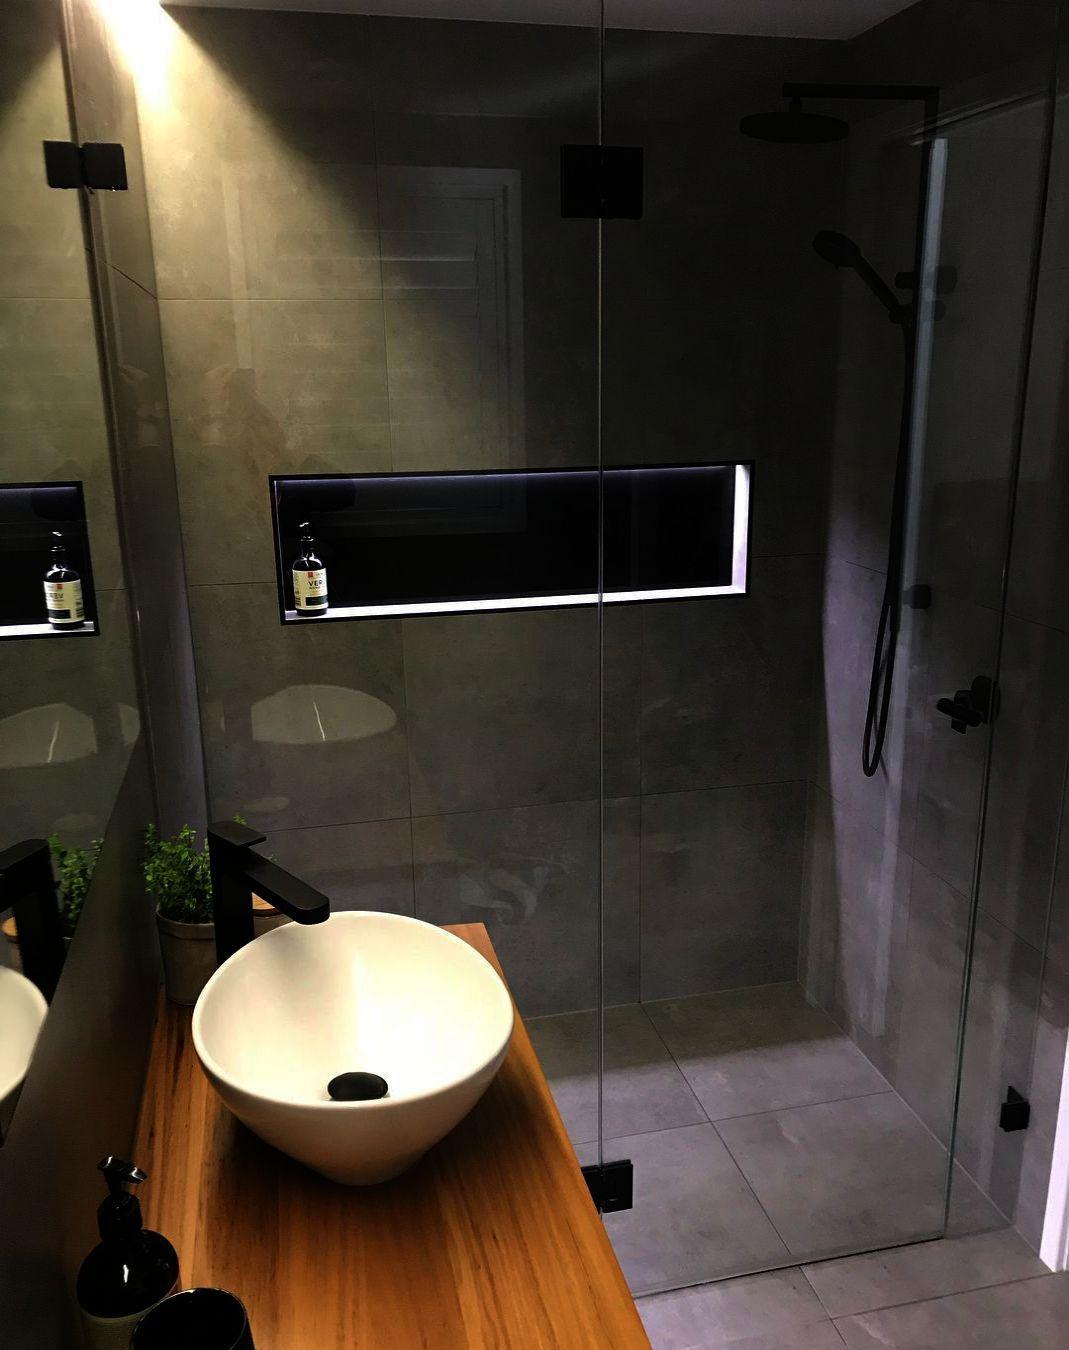 Bathroom Remodel Nightmare Long Bathroom Light Fixtures Contemporary Any Bathroom Light Fixt Pretty Bathroom Sets Mosaic Bathroom Accessories Bathroom Set Blue